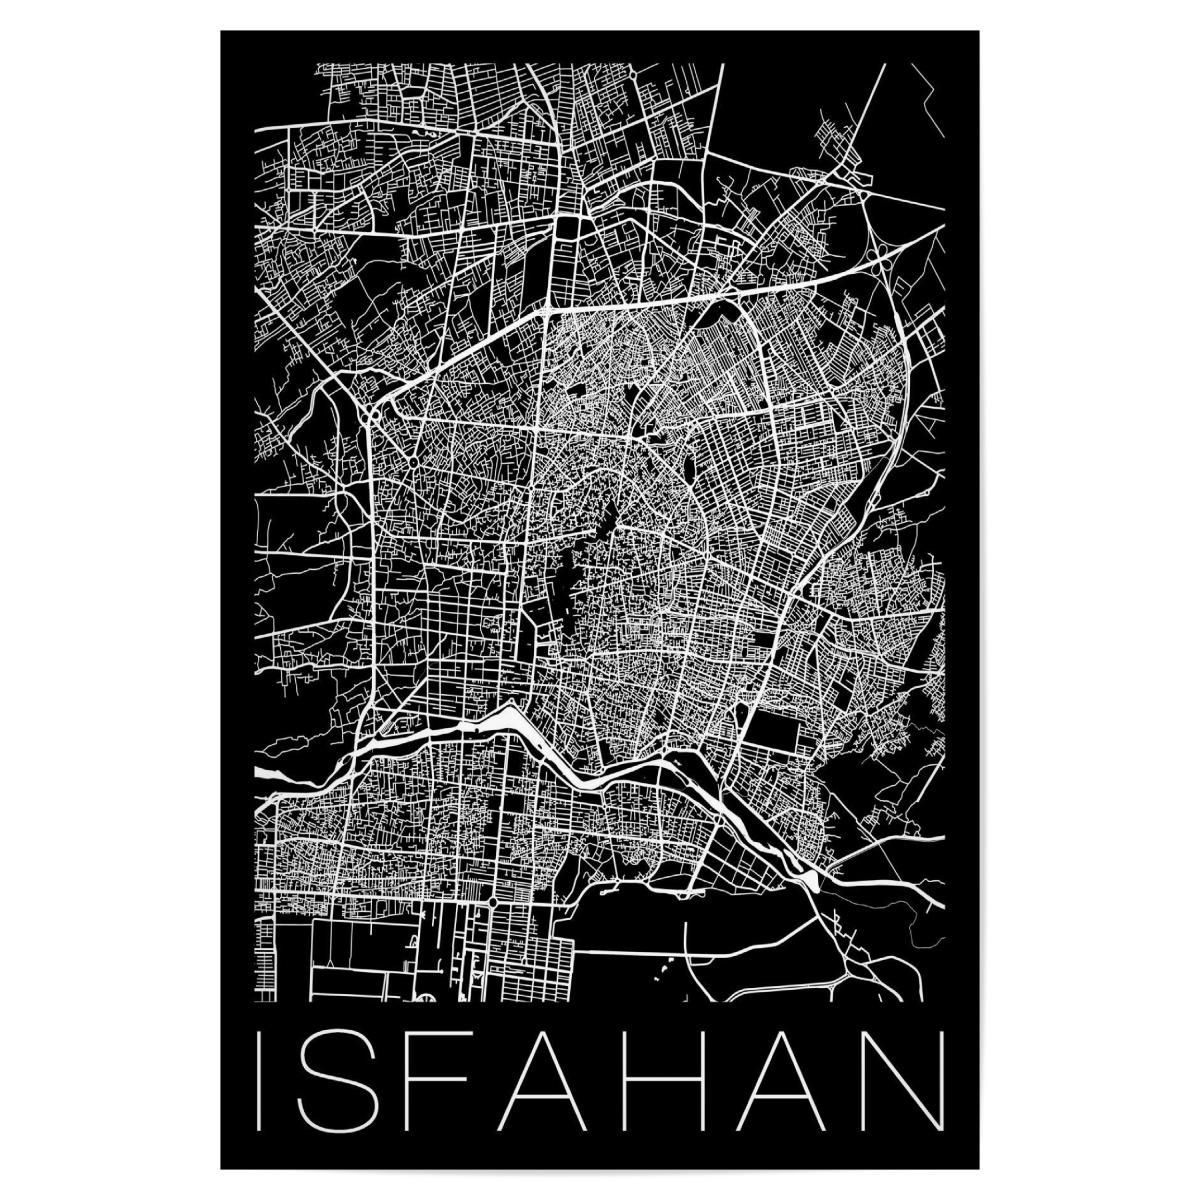 Retro Map of Isfahan Iran als Poster bei artboxONE kaufen